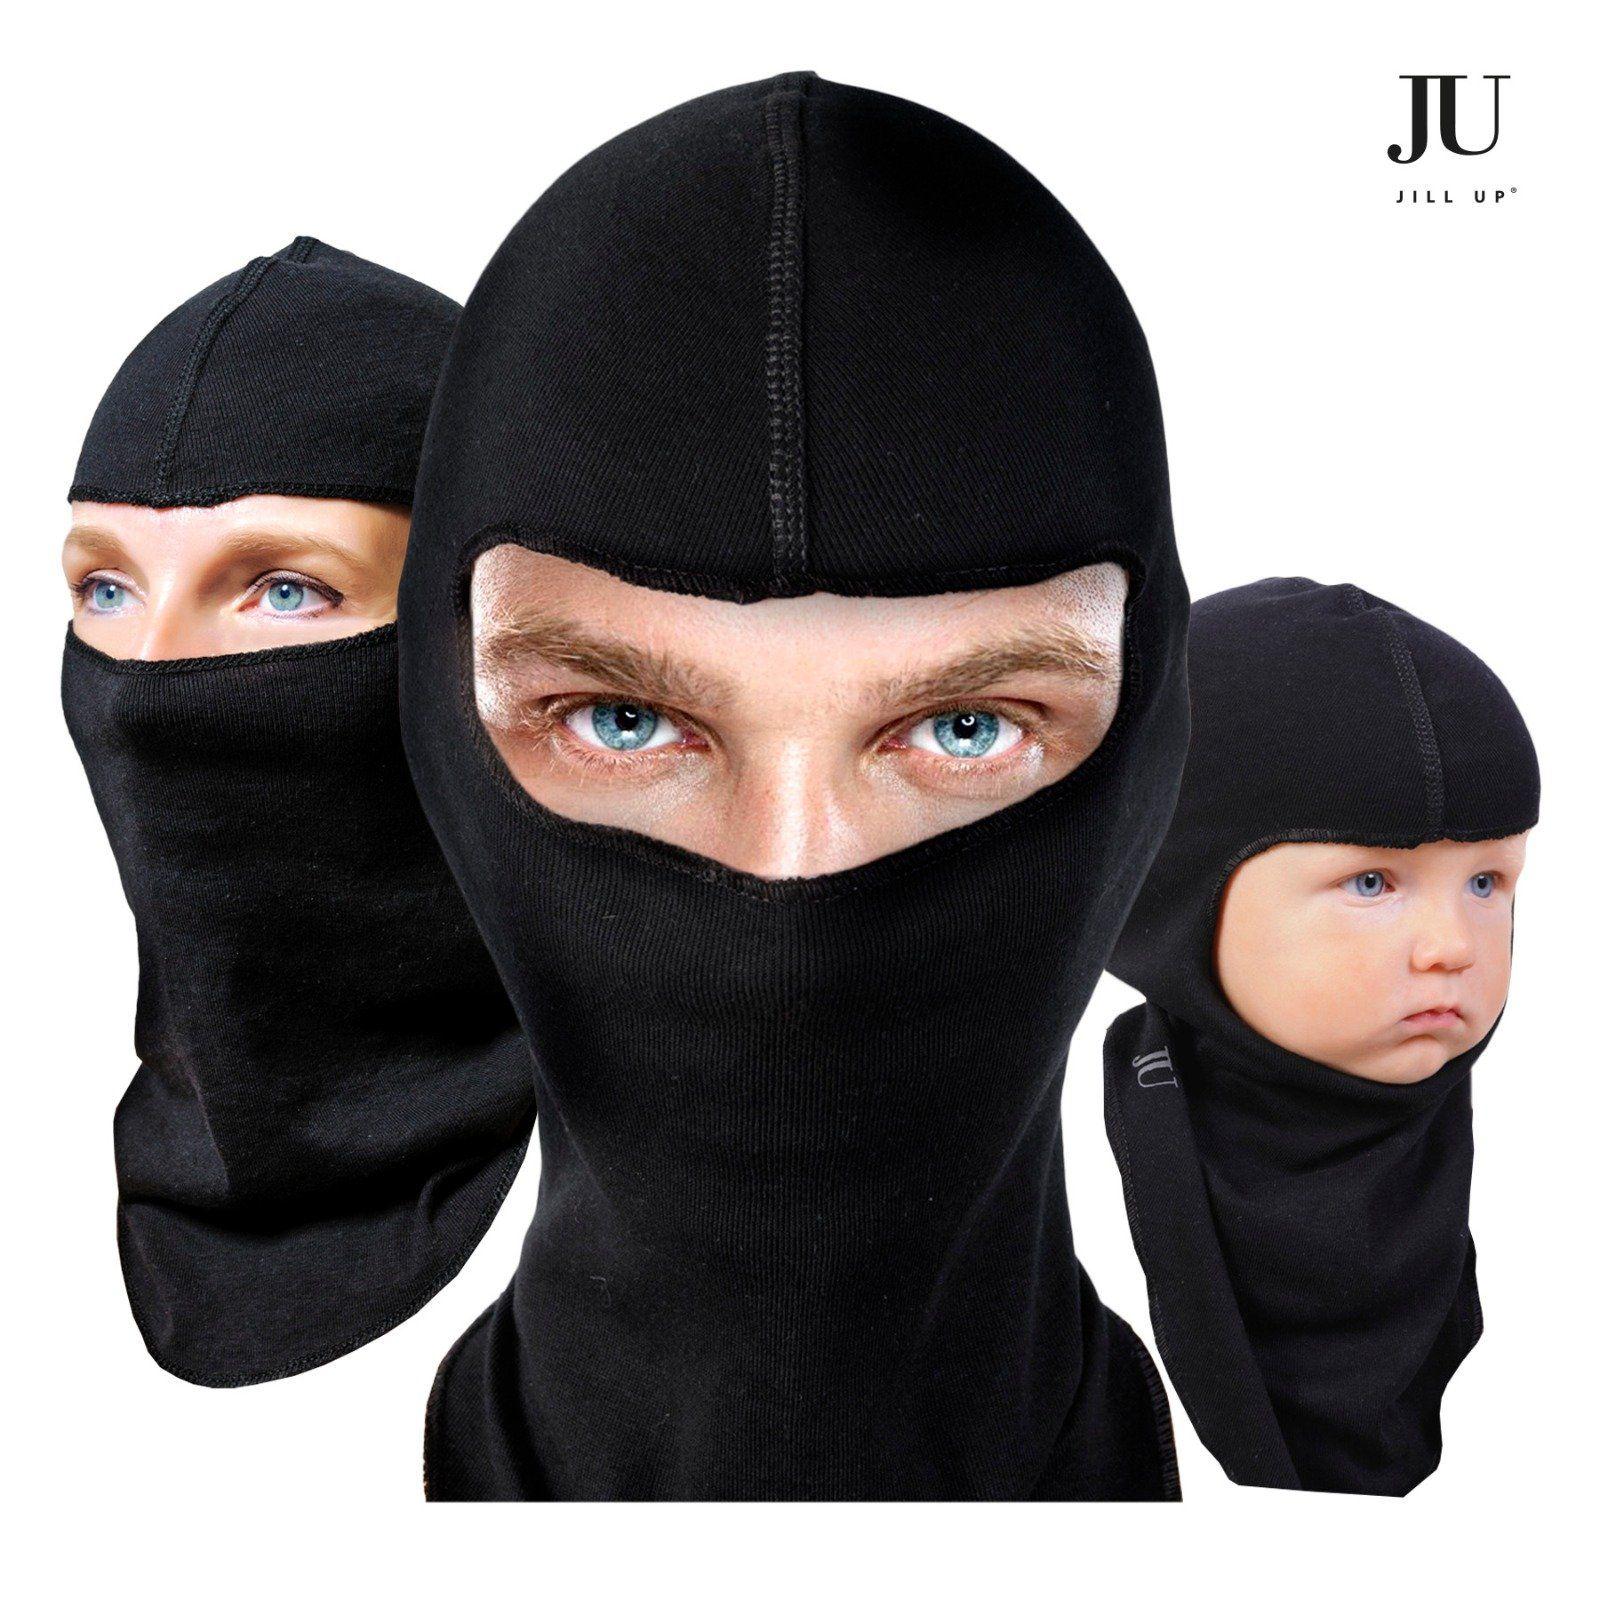 2 PACK  Multipurpose Balaclava Full Face Ski Mask - Regular   Winter  Protection Best 20fae8024